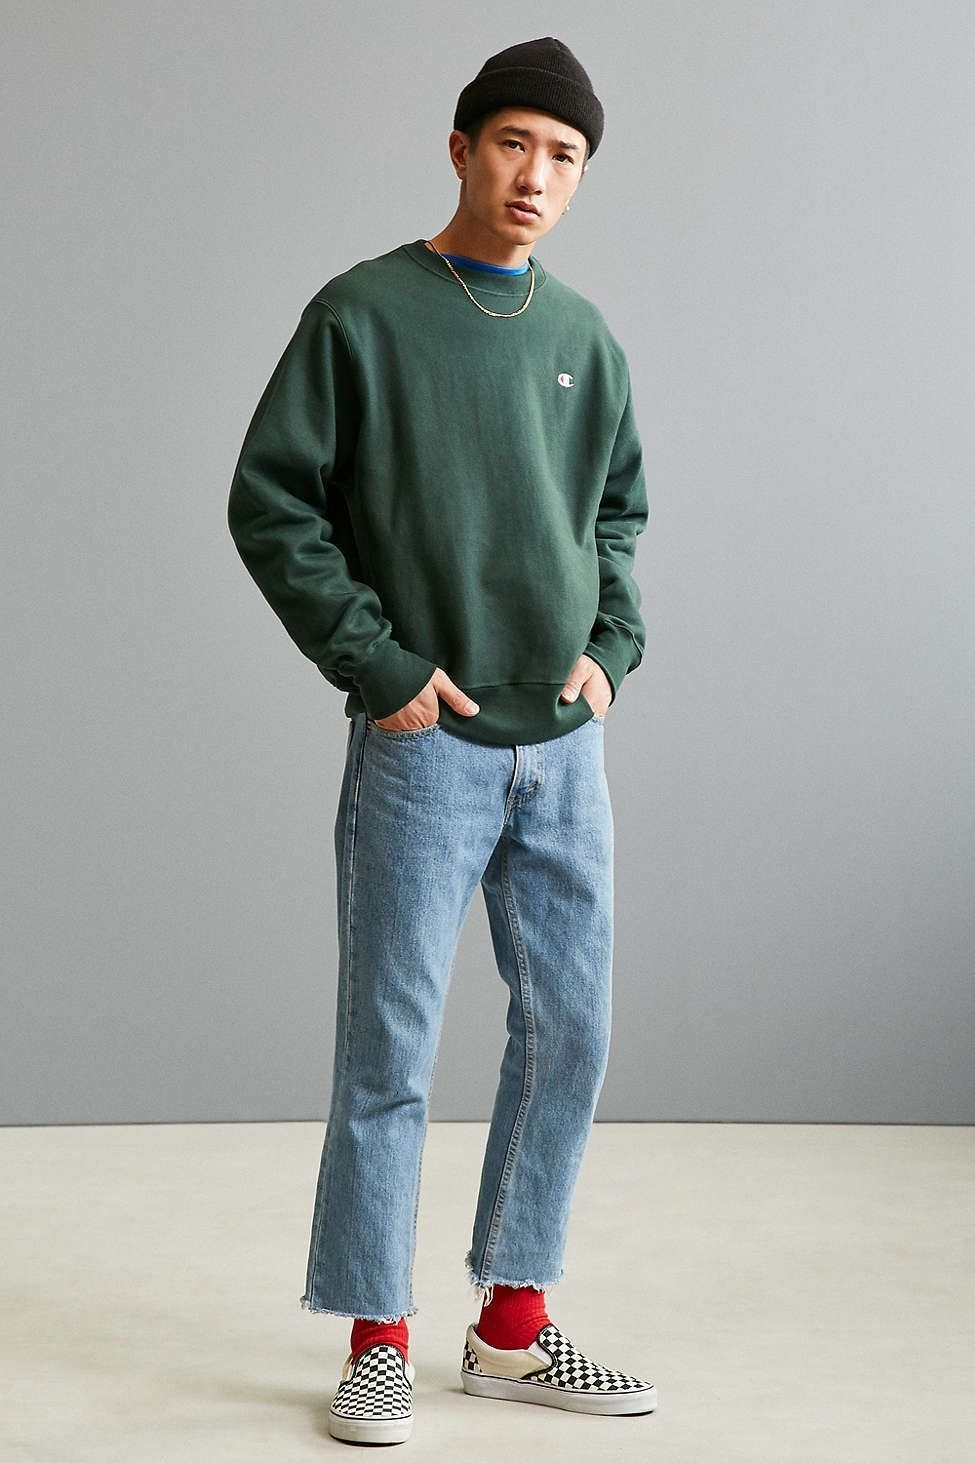 adf691817c7 Champion Reverse Weave Fleece Crew Neck Sweatshirt - Urban Outfitters   Mensoutfits